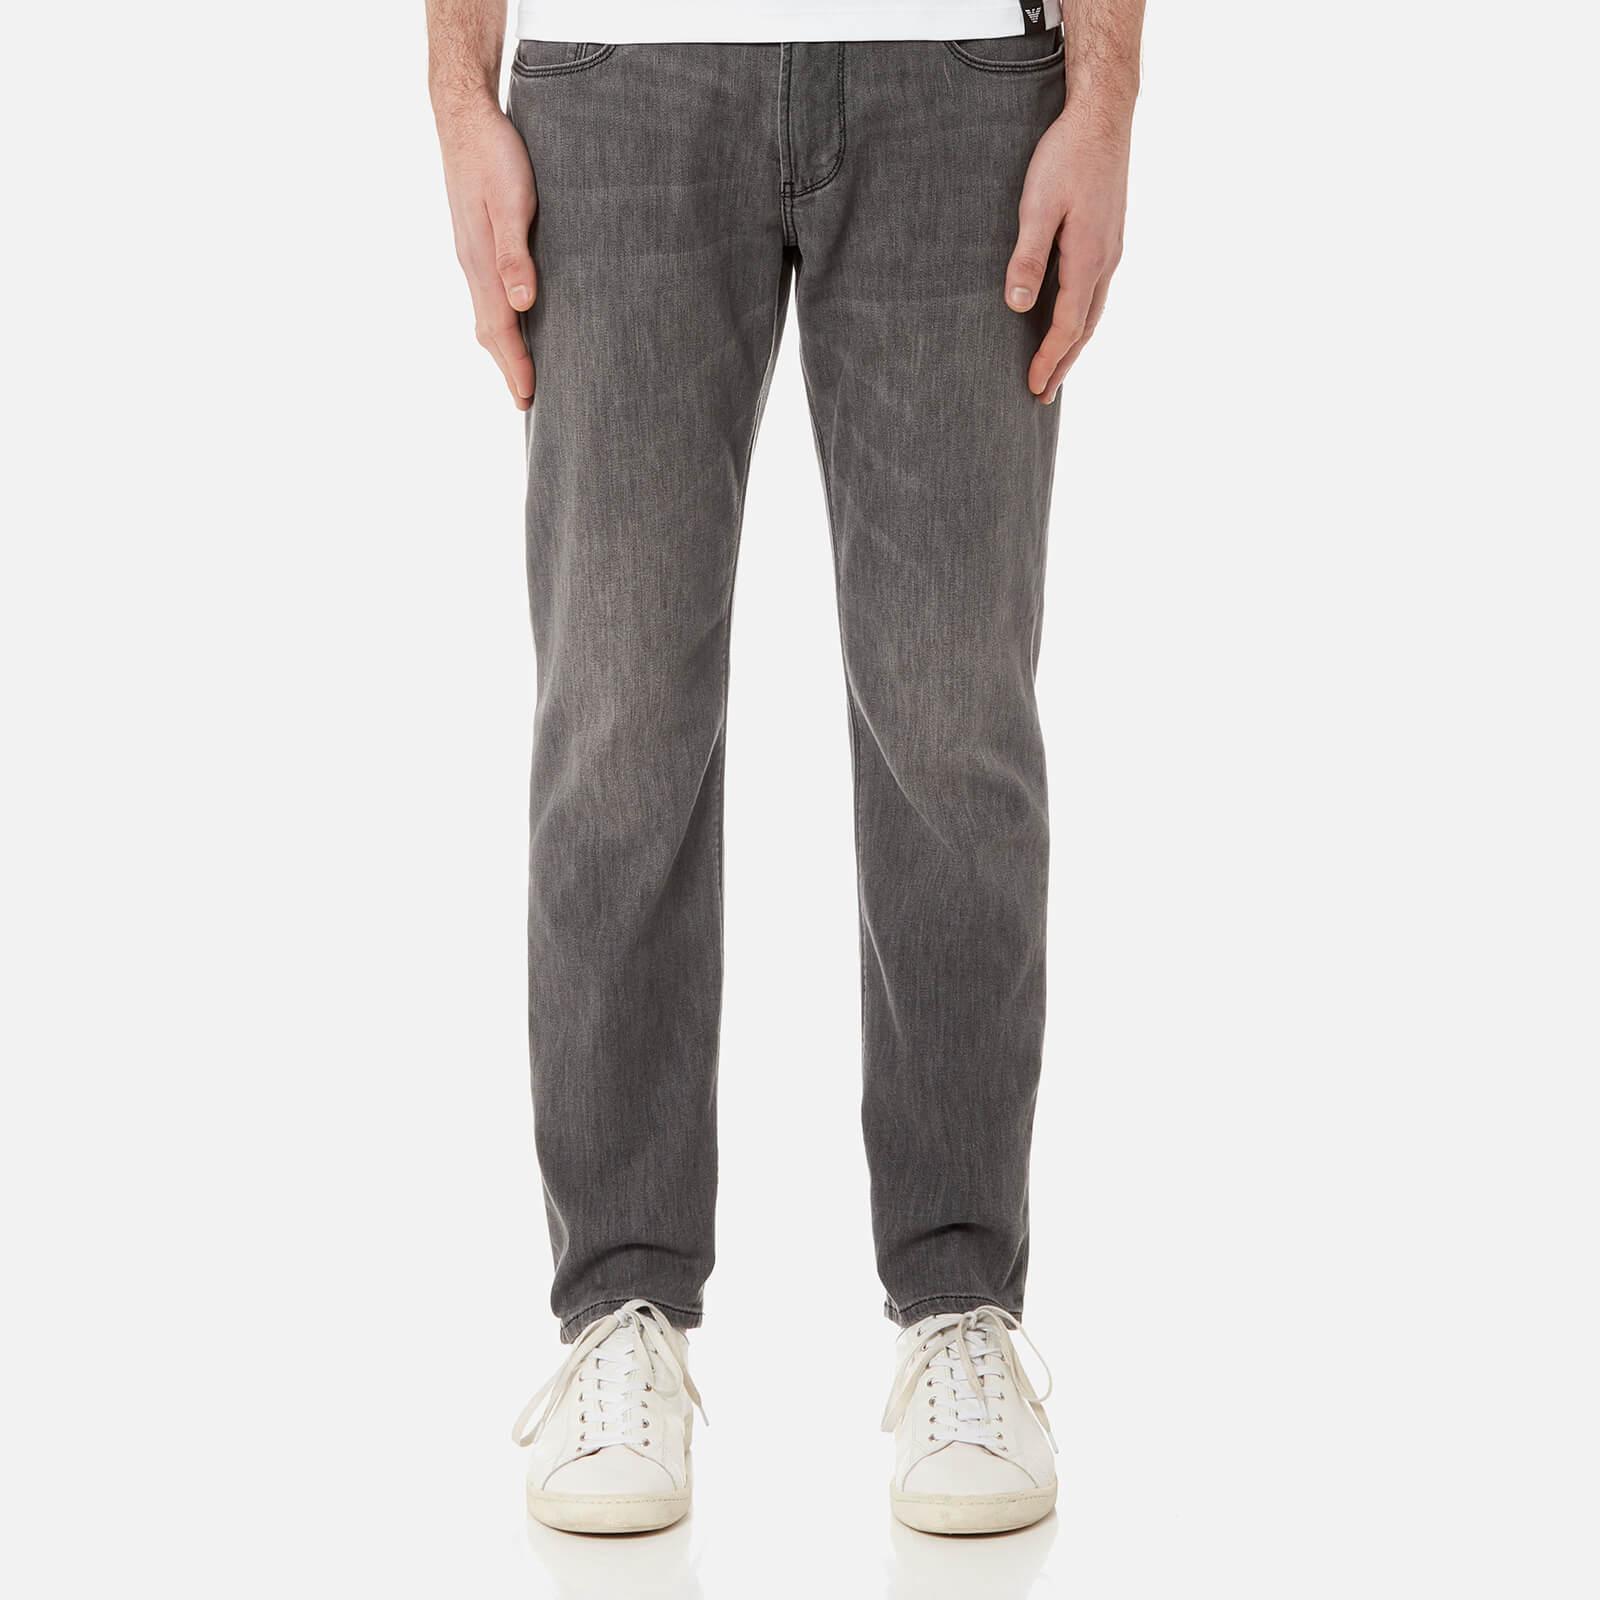 d15b7d11e5f7f Emporio Armani Men s J06 5 Pocket Slim Jeans - Washed Black - Free UK  Delivery over £50